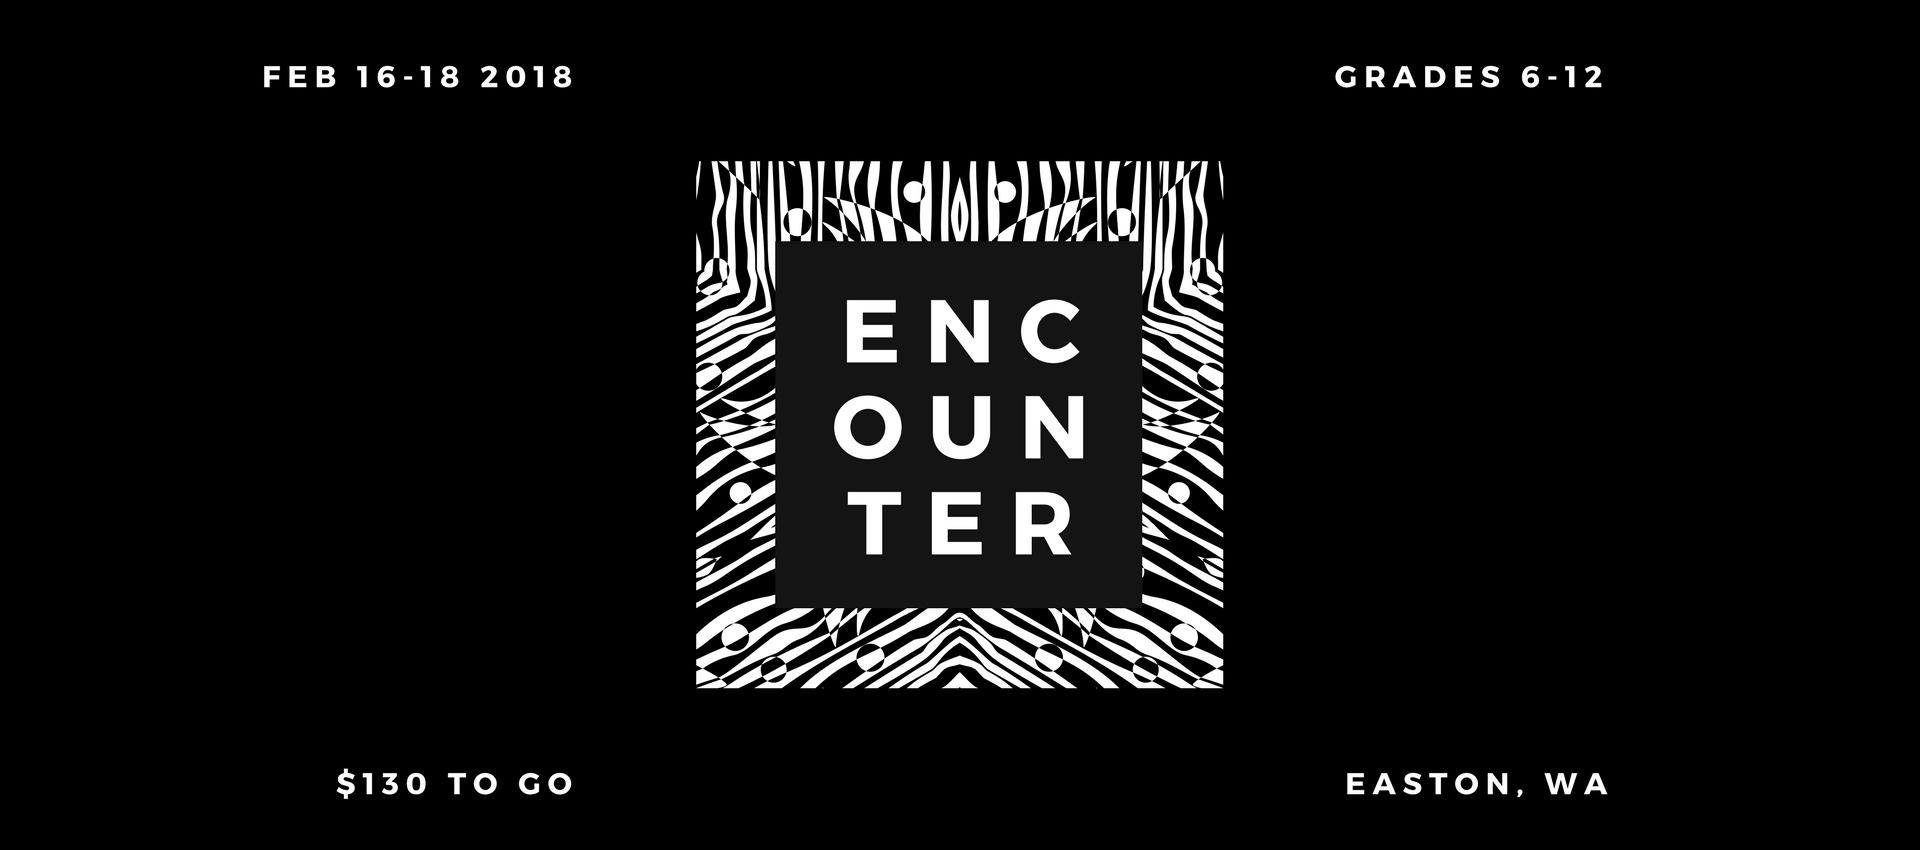 Encounter Winter Camp - $130 - February 16-18